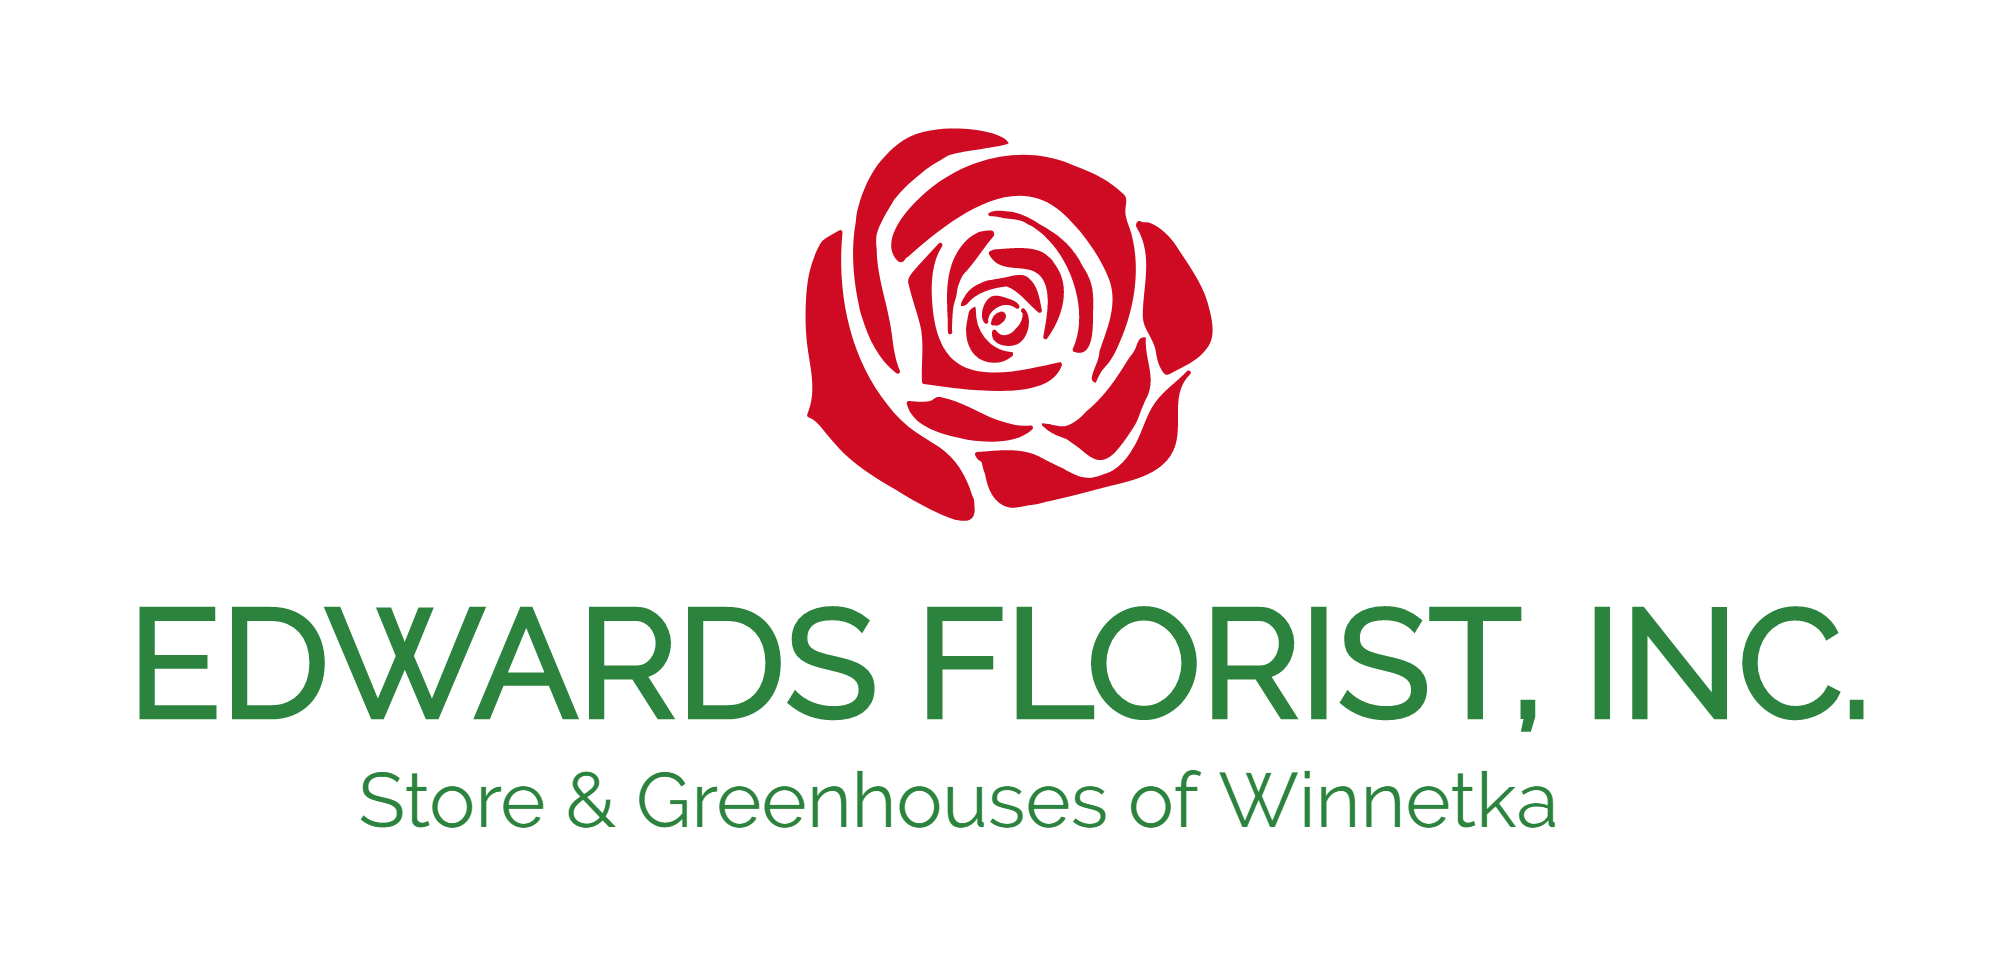 EDWARDS FLORIST, INC.-S&G logo.png